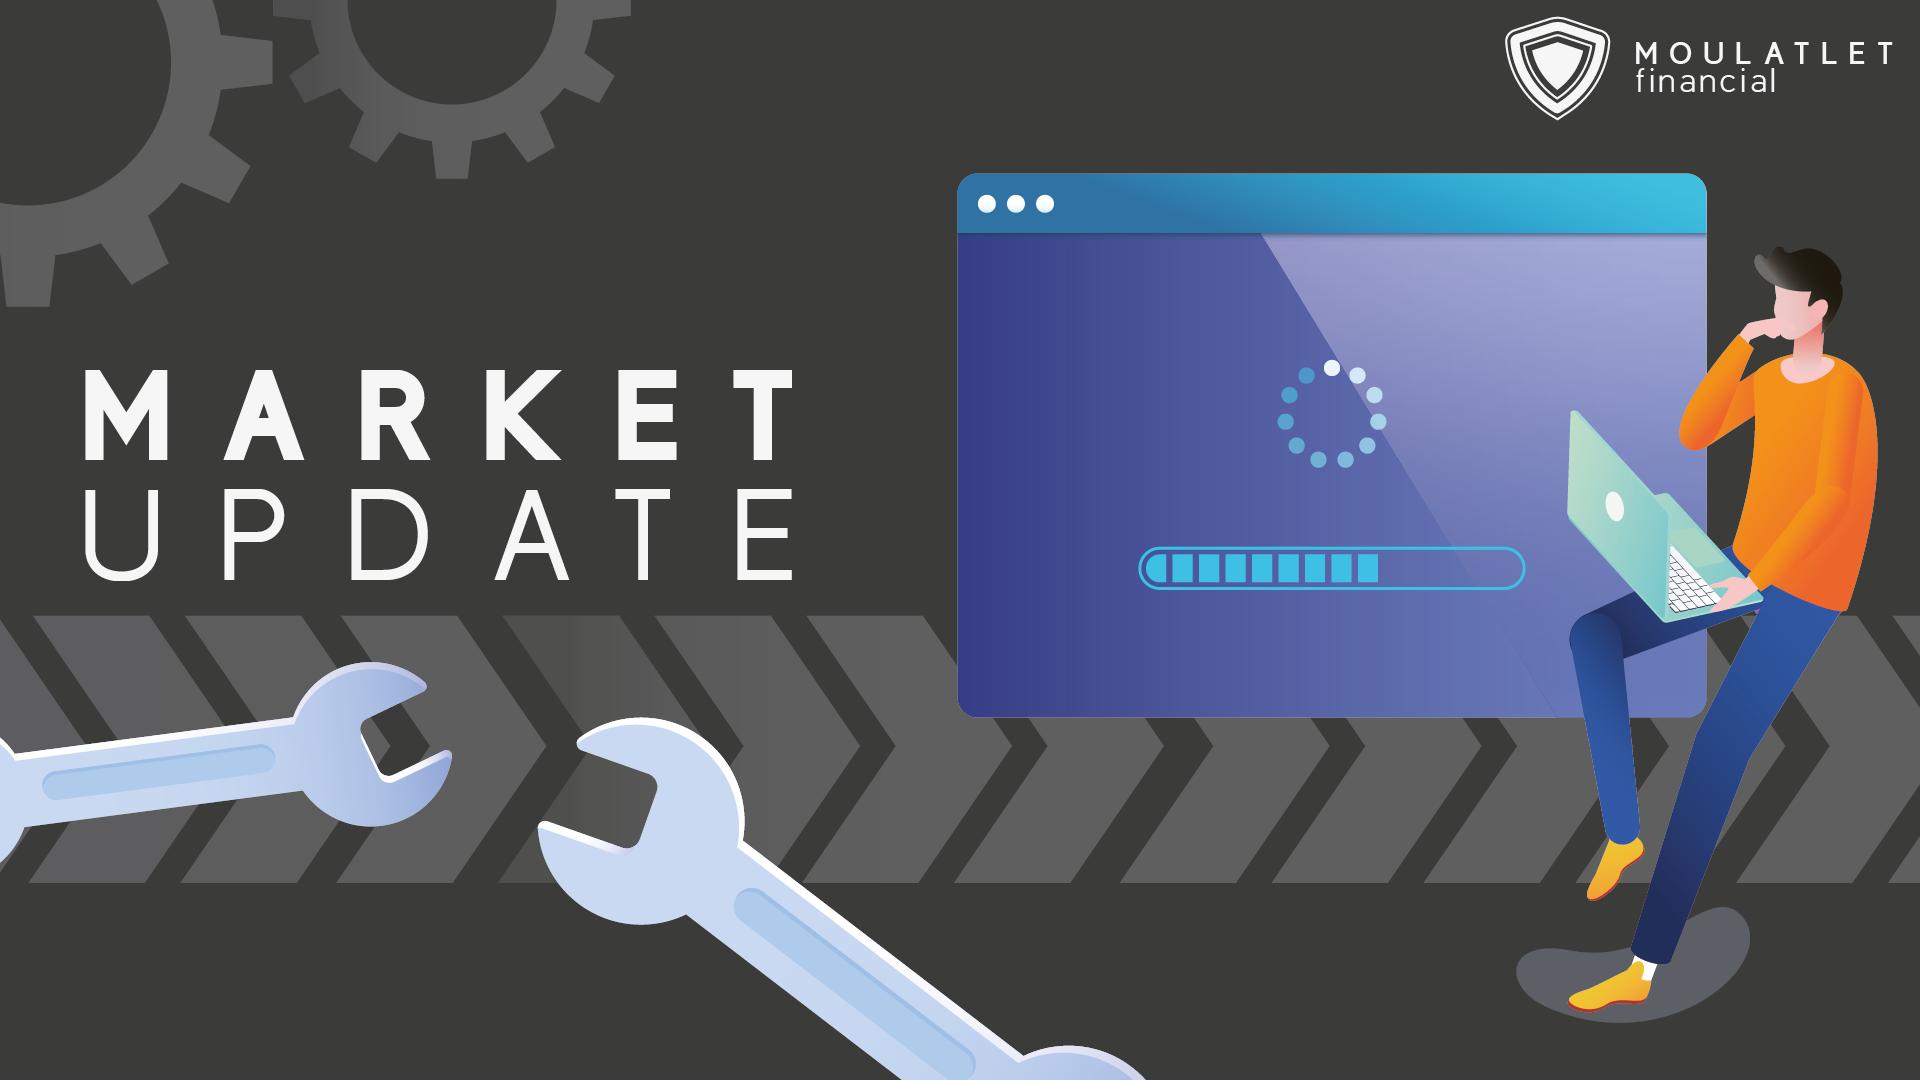 Market Update Q4 2019 Thumbnail